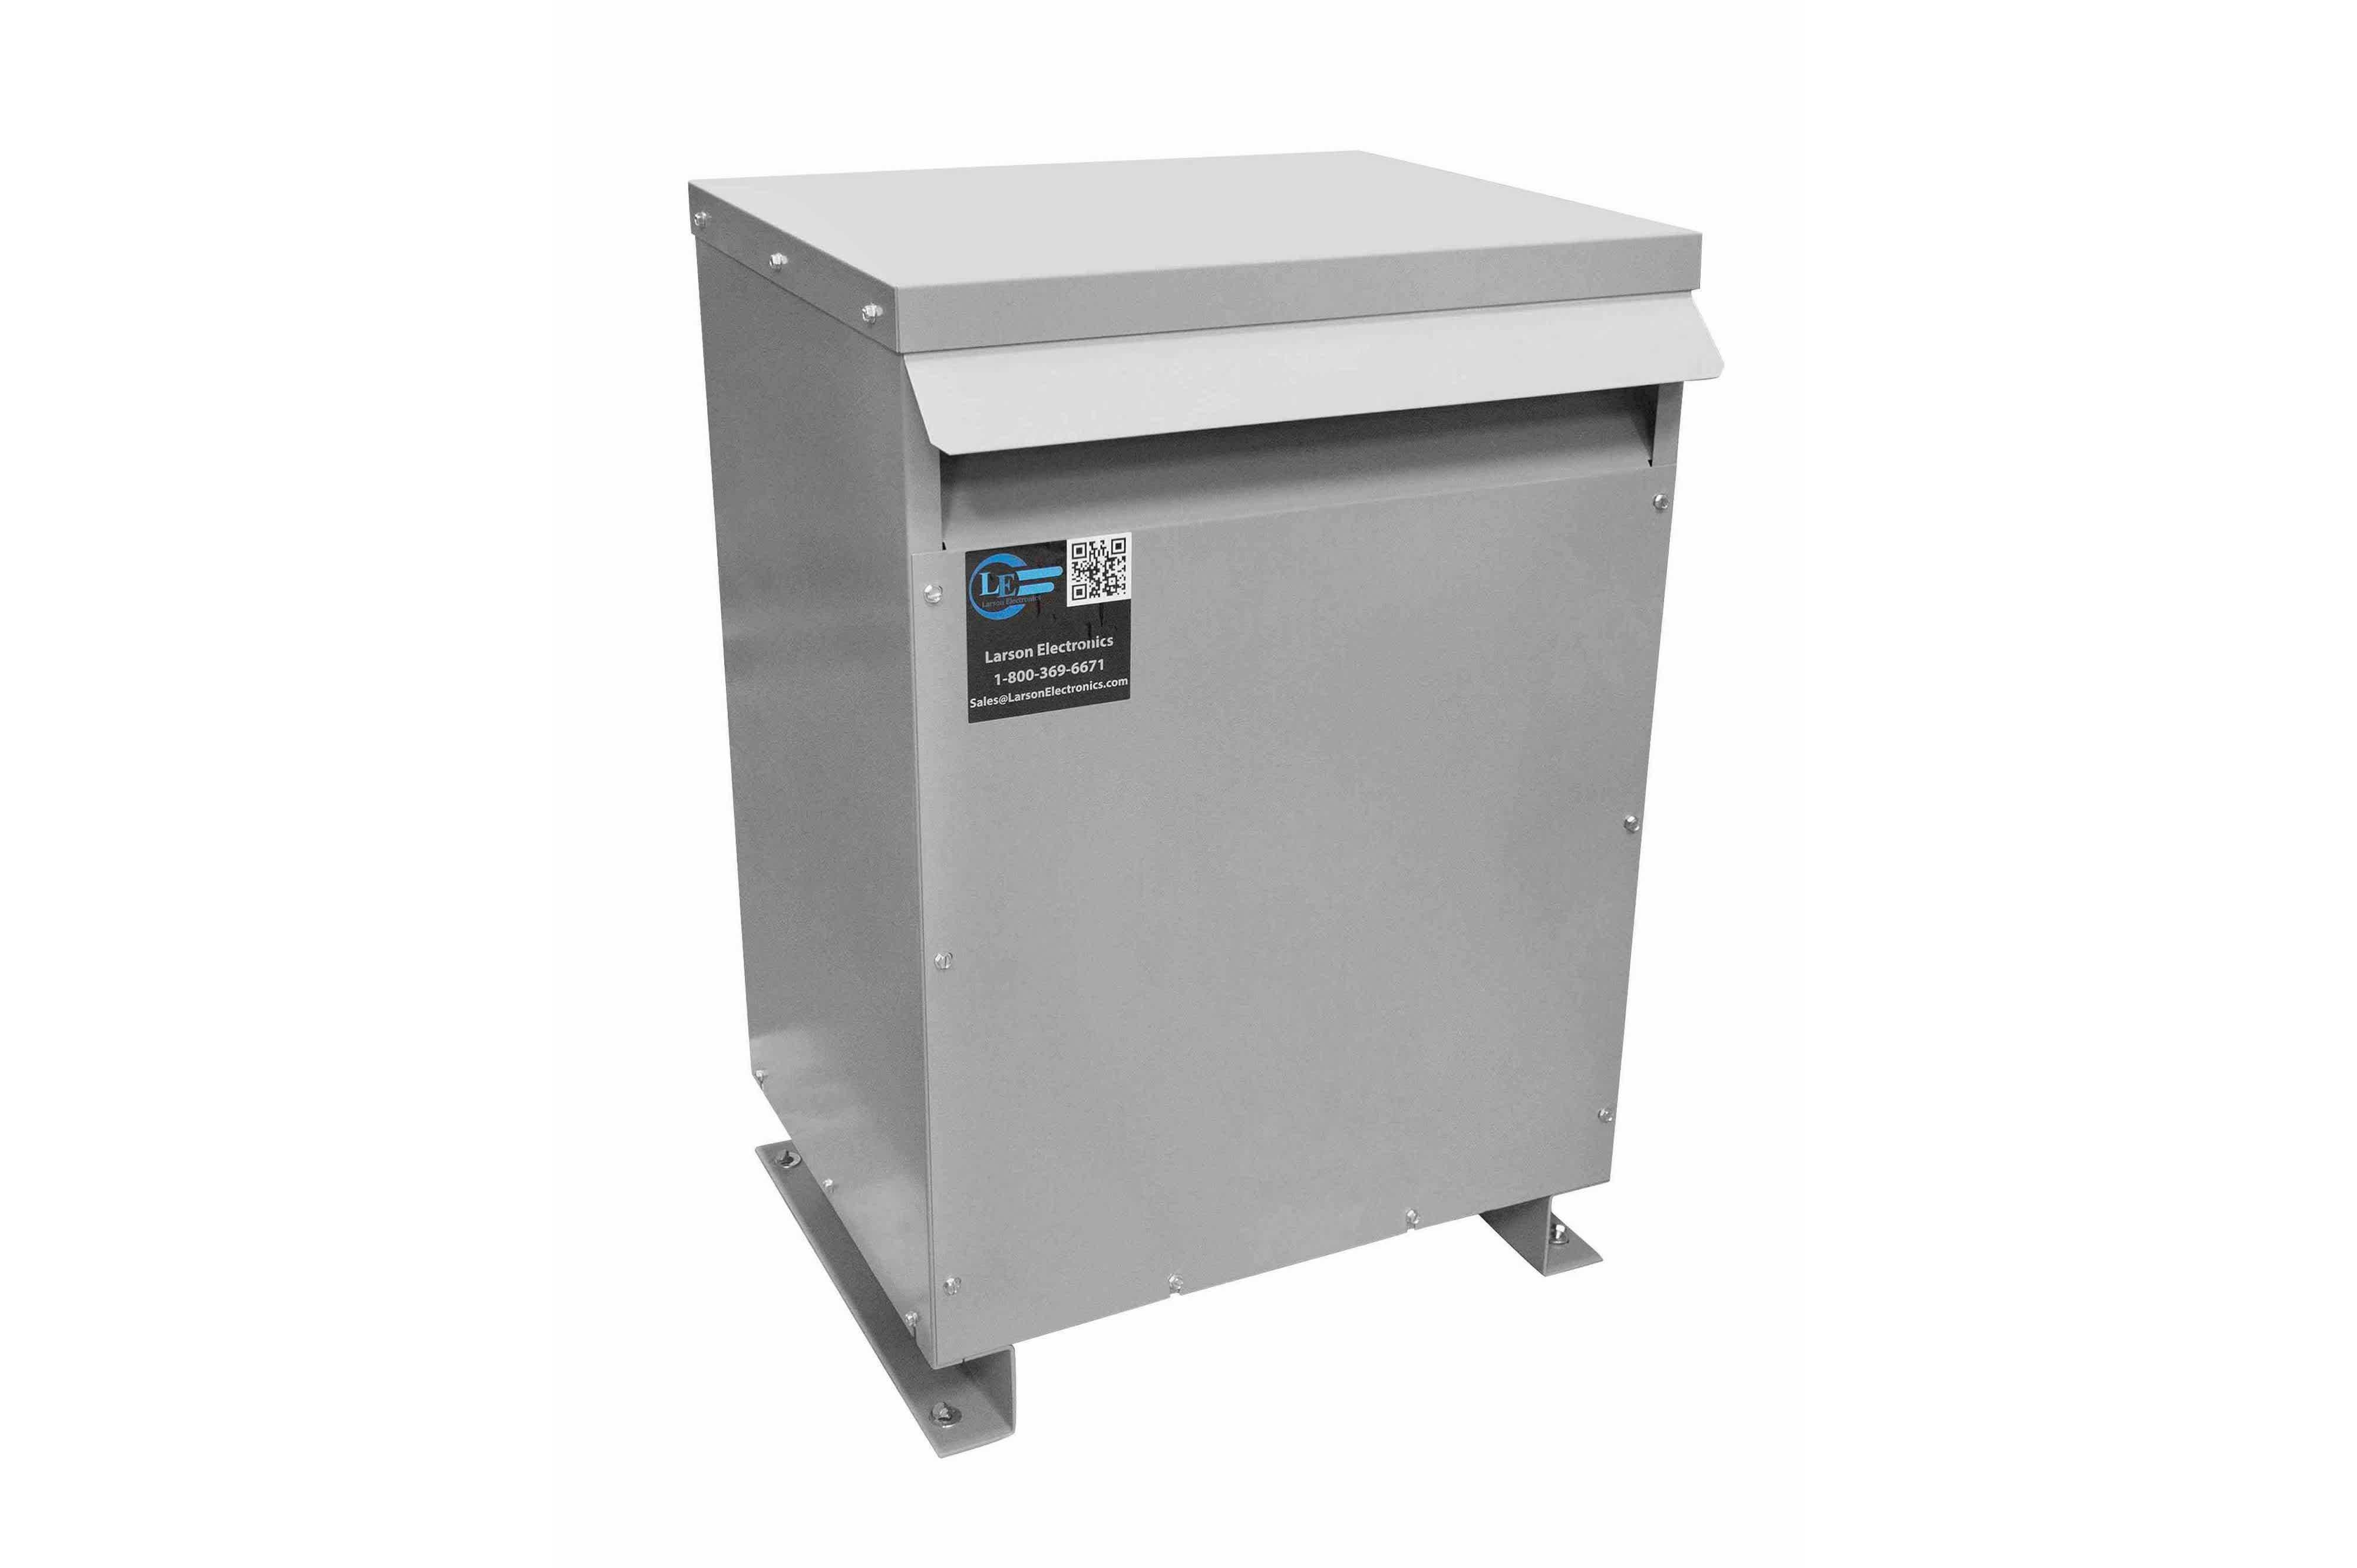 175 kVA 3PH Isolation Transformer, 380V Wye Primary, 208V Delta Secondary, N3R, Ventilated, 60 Hz